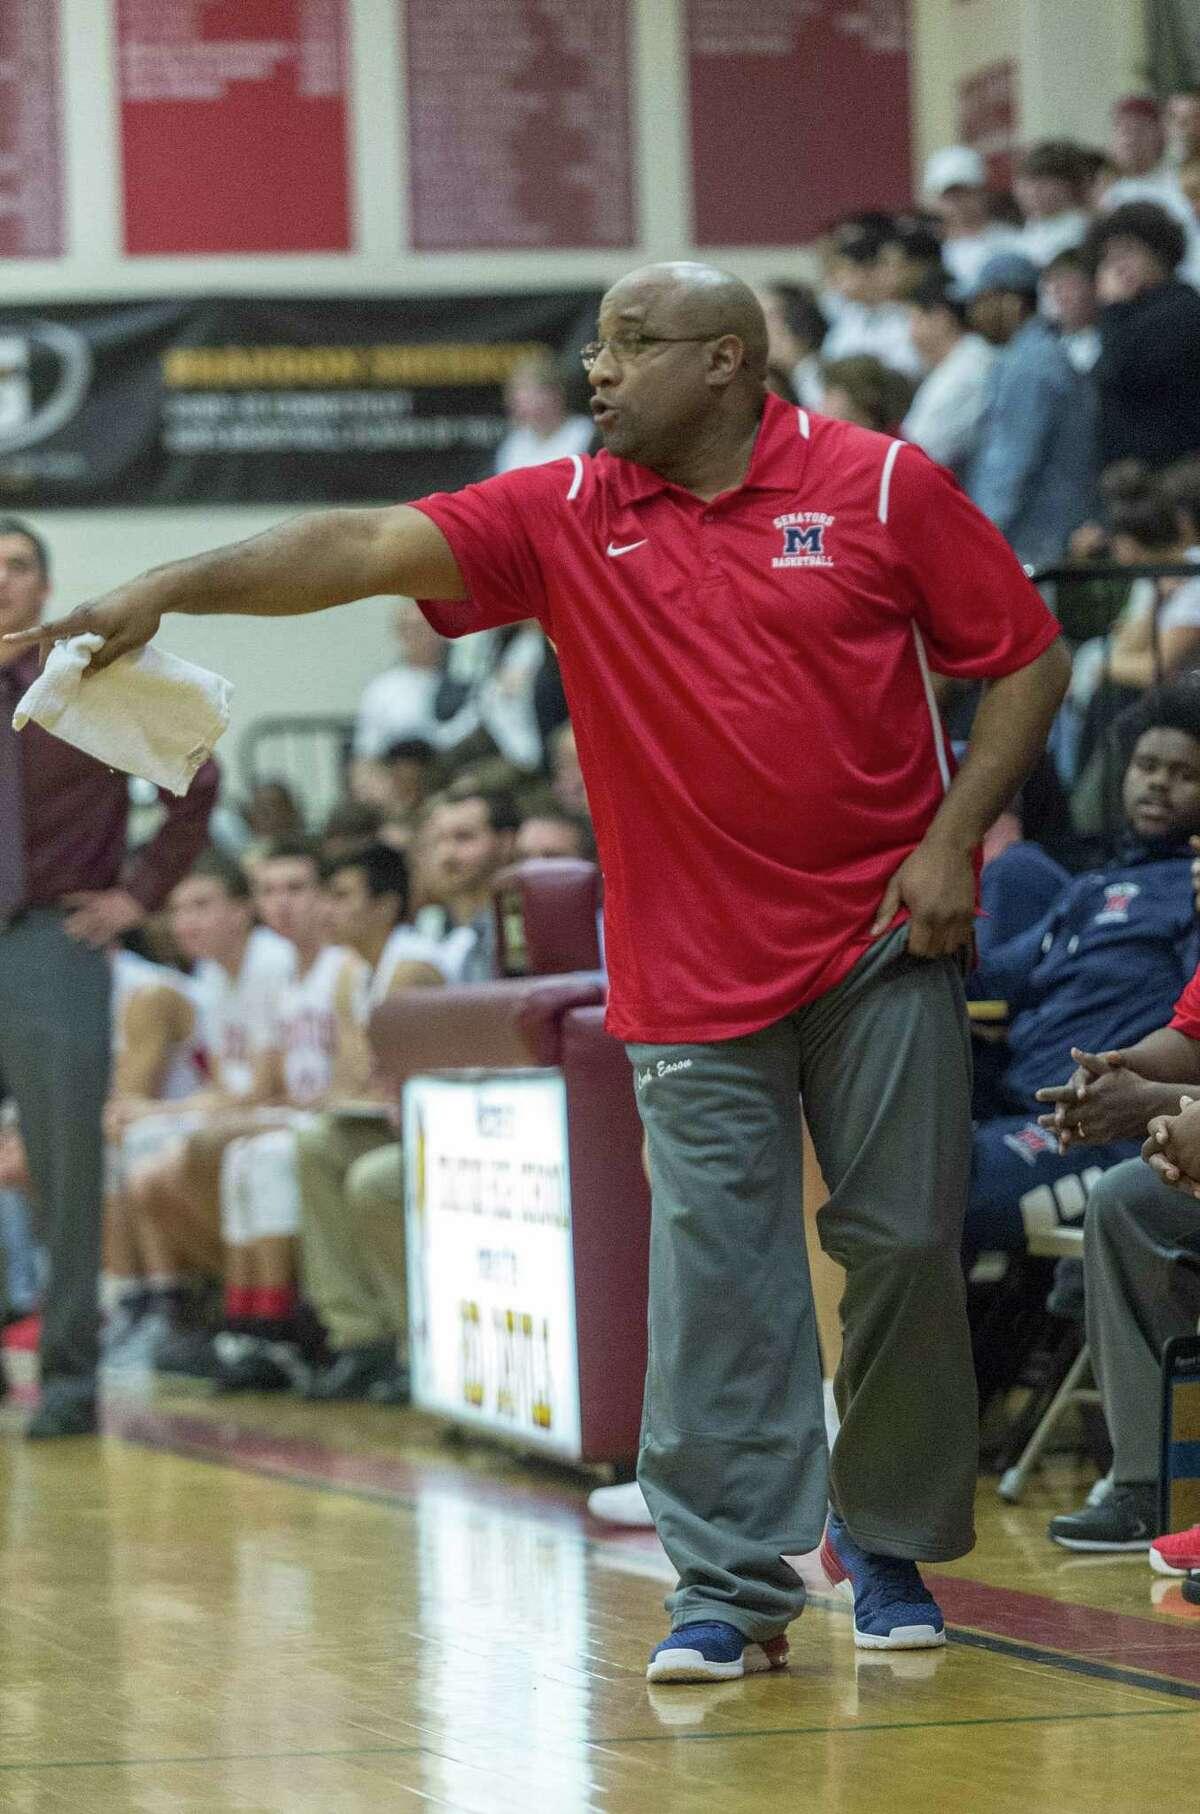 Brien McMahon High School head coach Darrick Eason gives his team instructions during a boys basketball game against Stratford High School played at Stratford High School, Stratford, CT. Thursday, December 21, 2017.